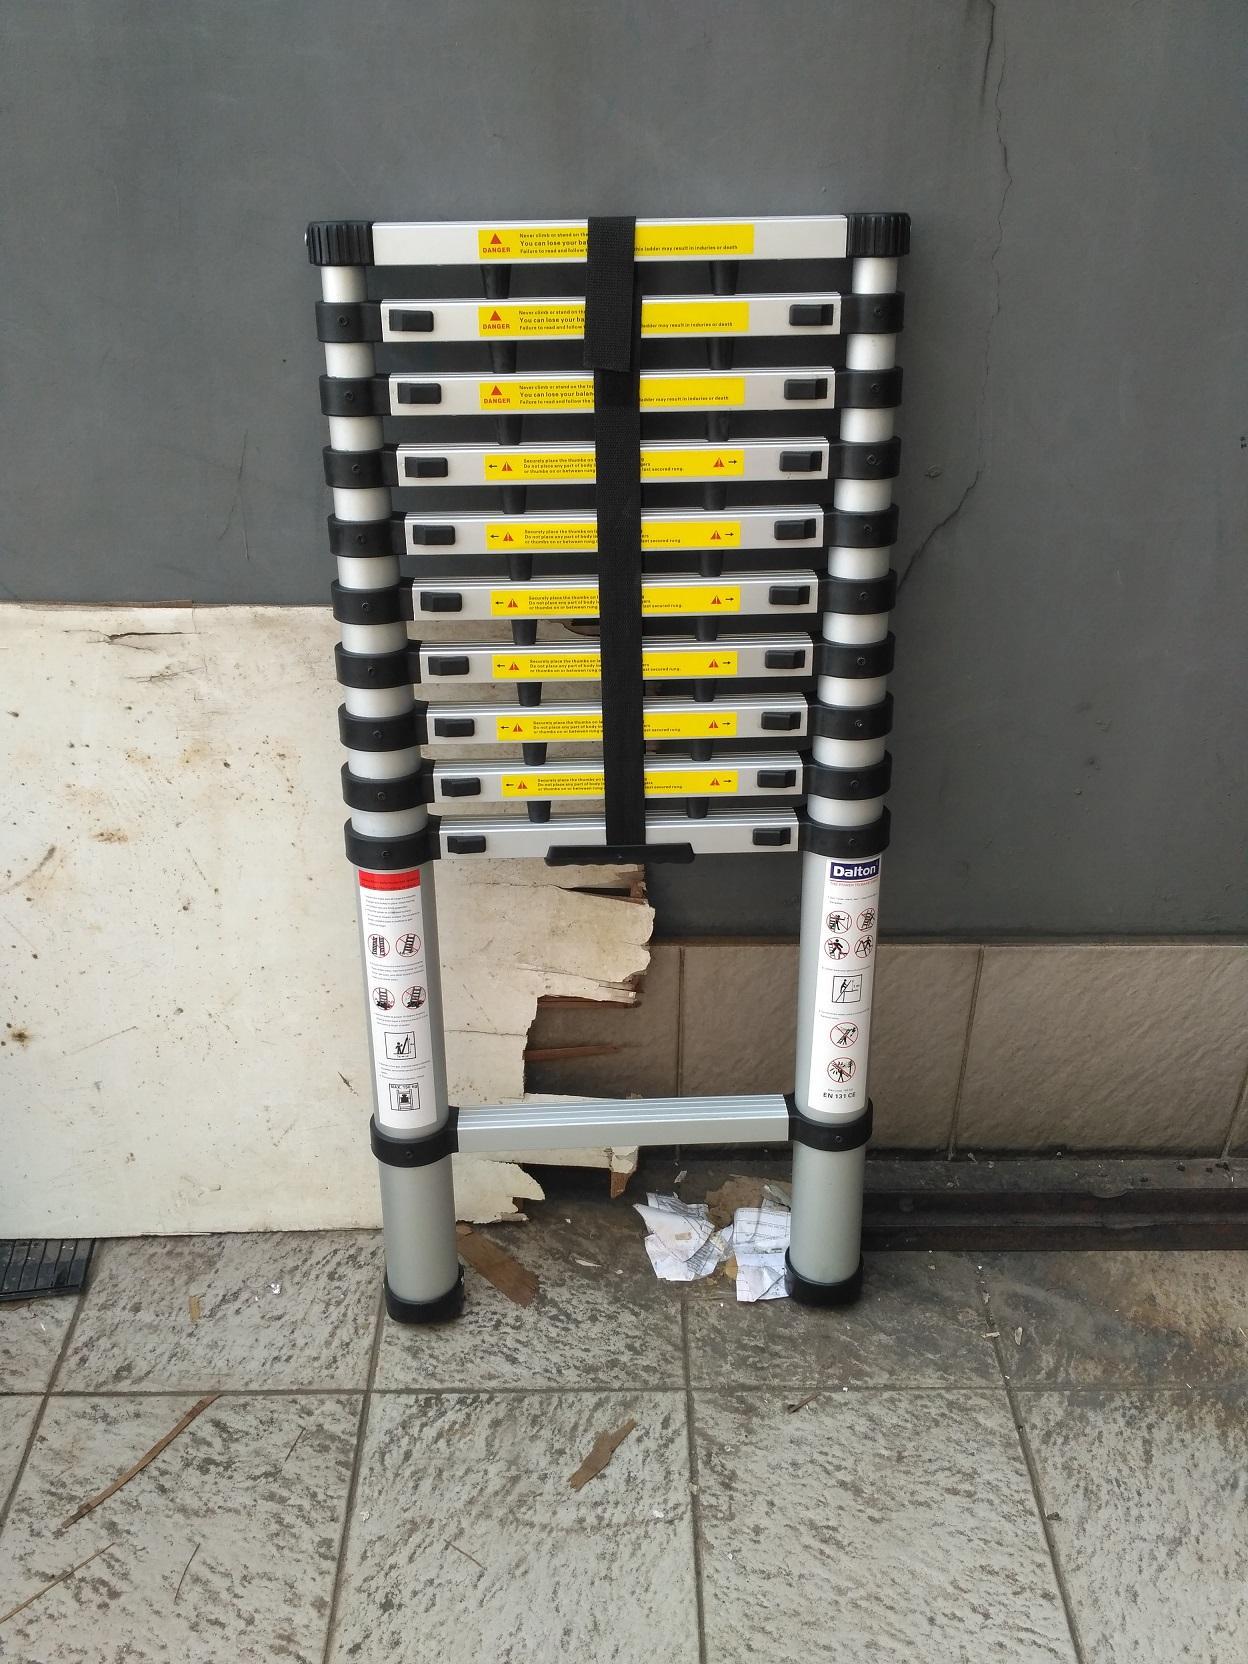 Tangga Pijakan Dalton Daftar Harga Desember 2018 Aluminium Step Ladder Ml 406 32 Meter Merk Single Telescopic